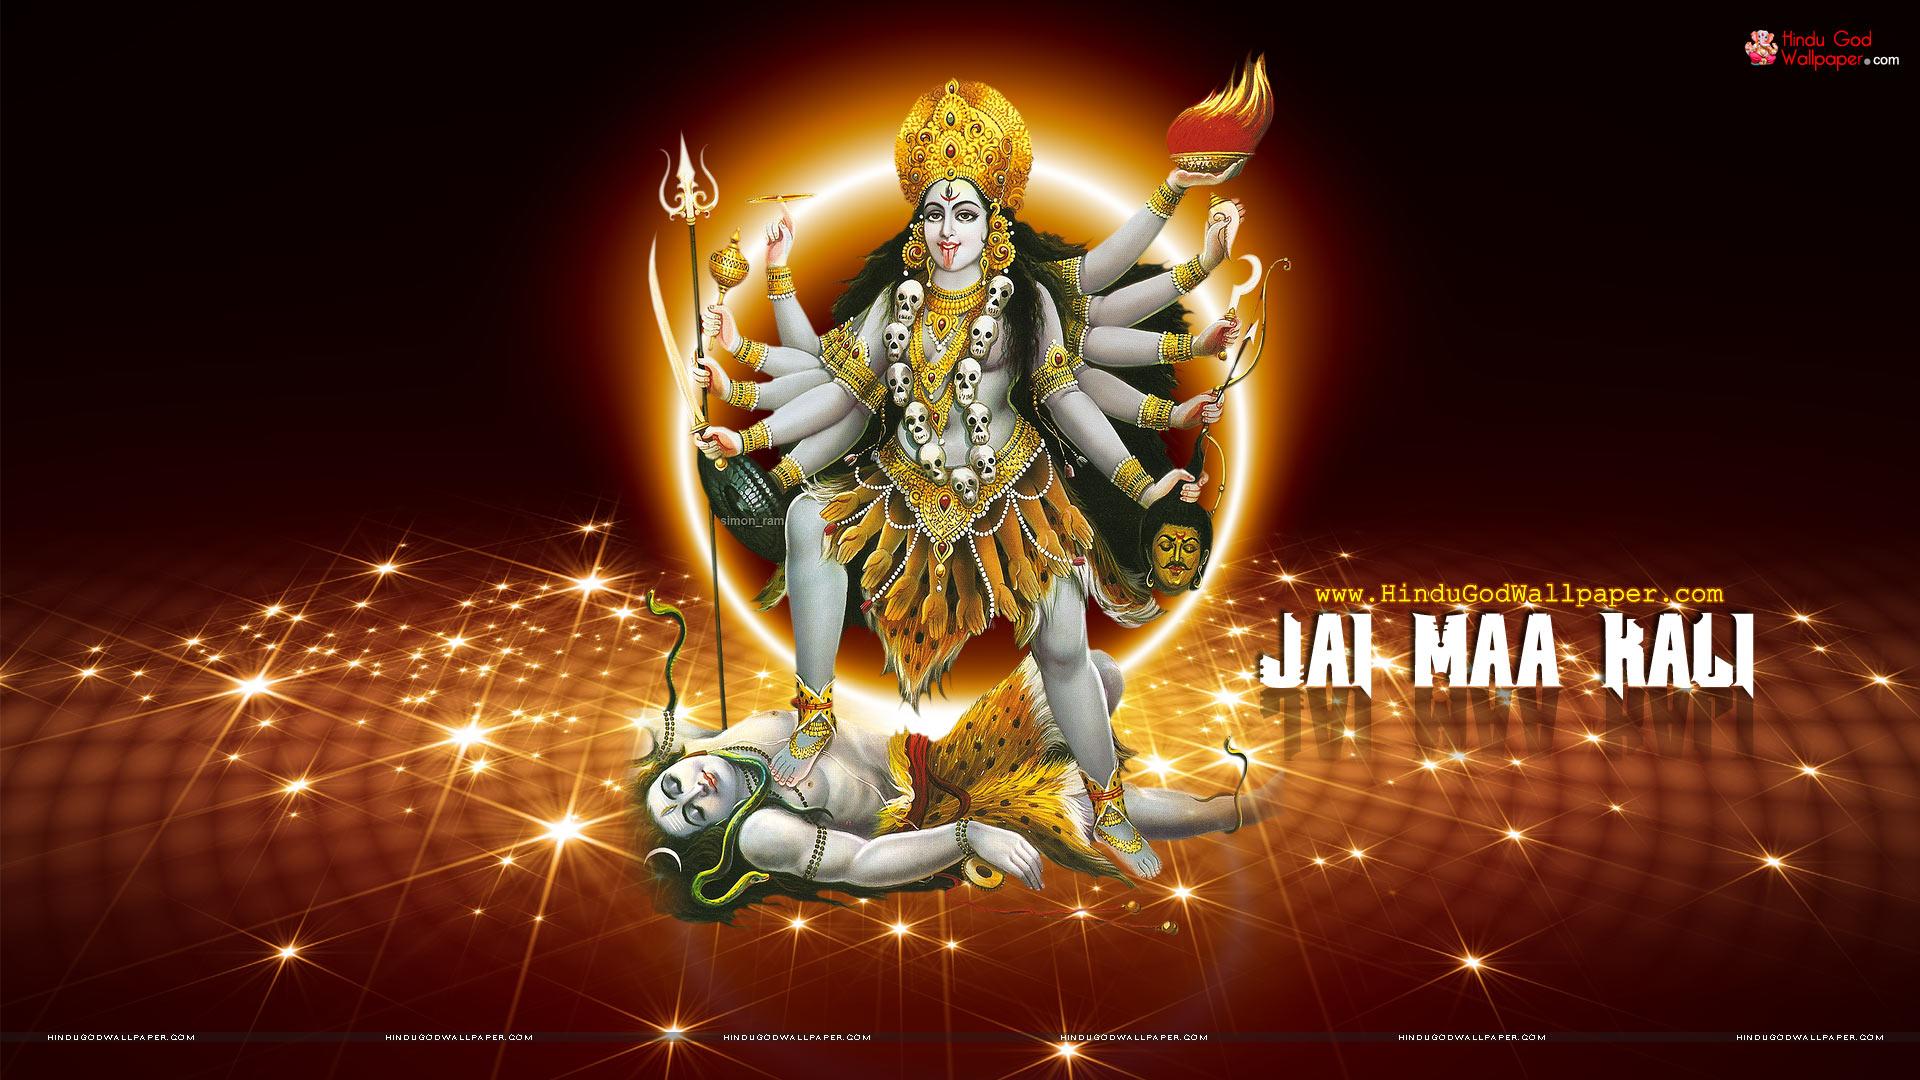 Maa Kali Wallpaper Hd Full Size Download